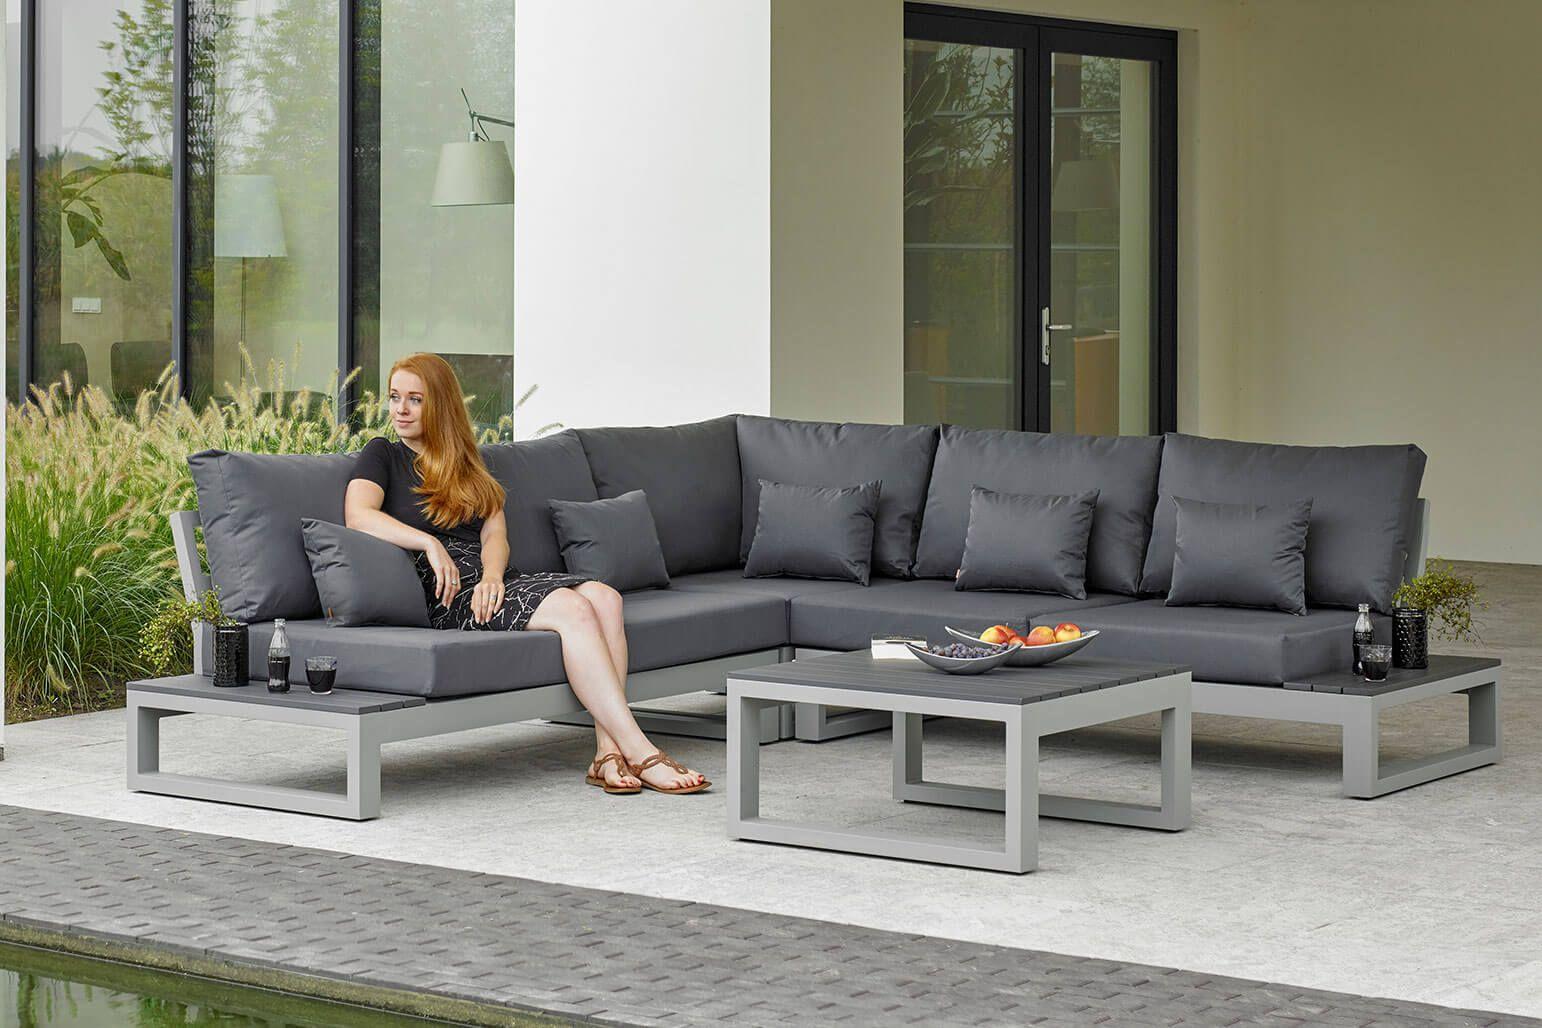 Neu Im Sortiment Von Life Outdoor Living Mit Dem Mallorca Lounge Set Konnen Sie Ein Modernes Design Aus Vollaluminium Outdoor Lounge Mobel Lounge Mobel Lounge